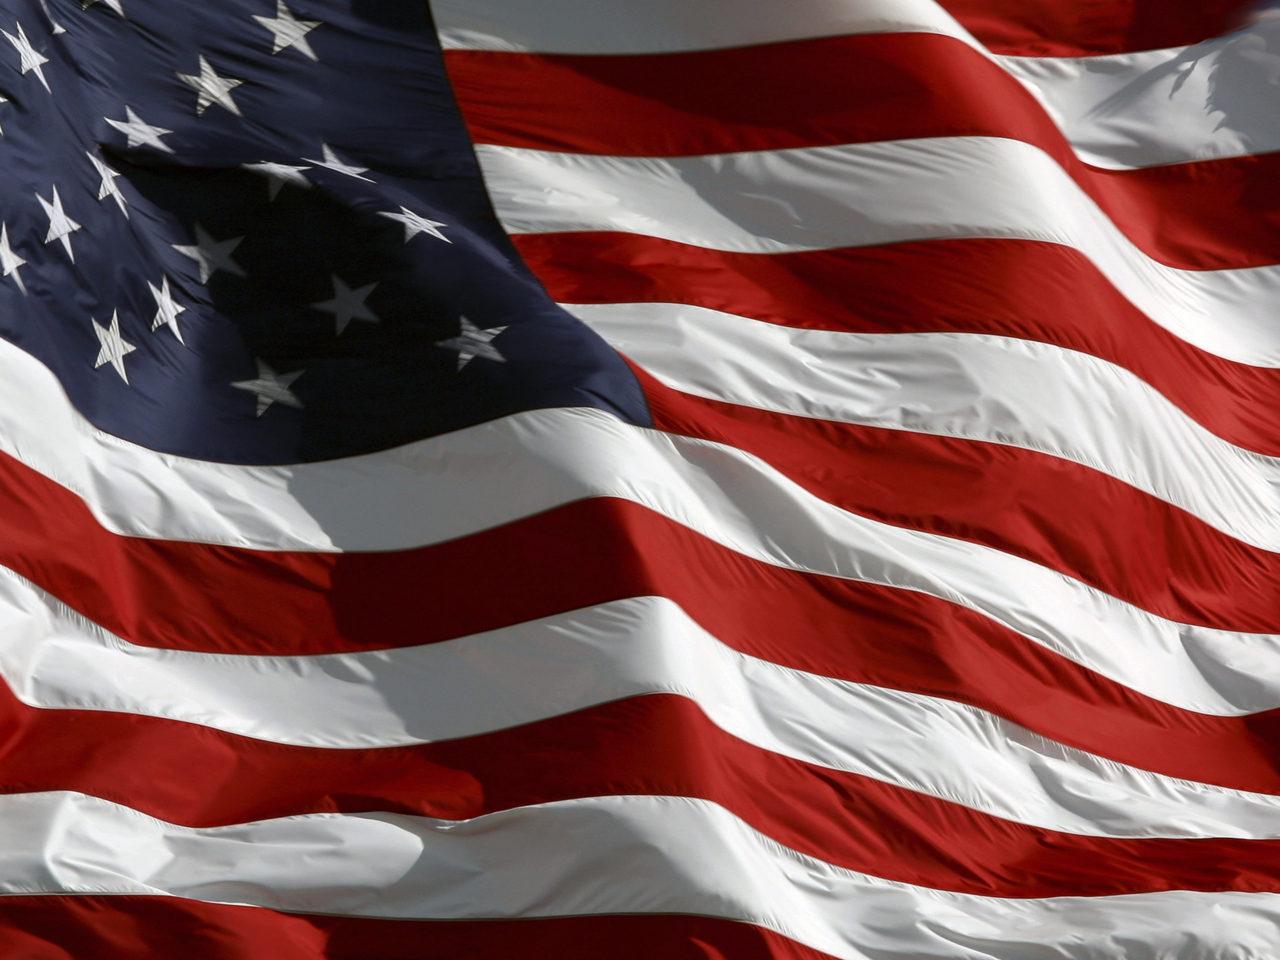 Merry Christmas 3d Wallpaper Hd American Flag For Desktop Wallpapers Hd Wallpapers13 Com